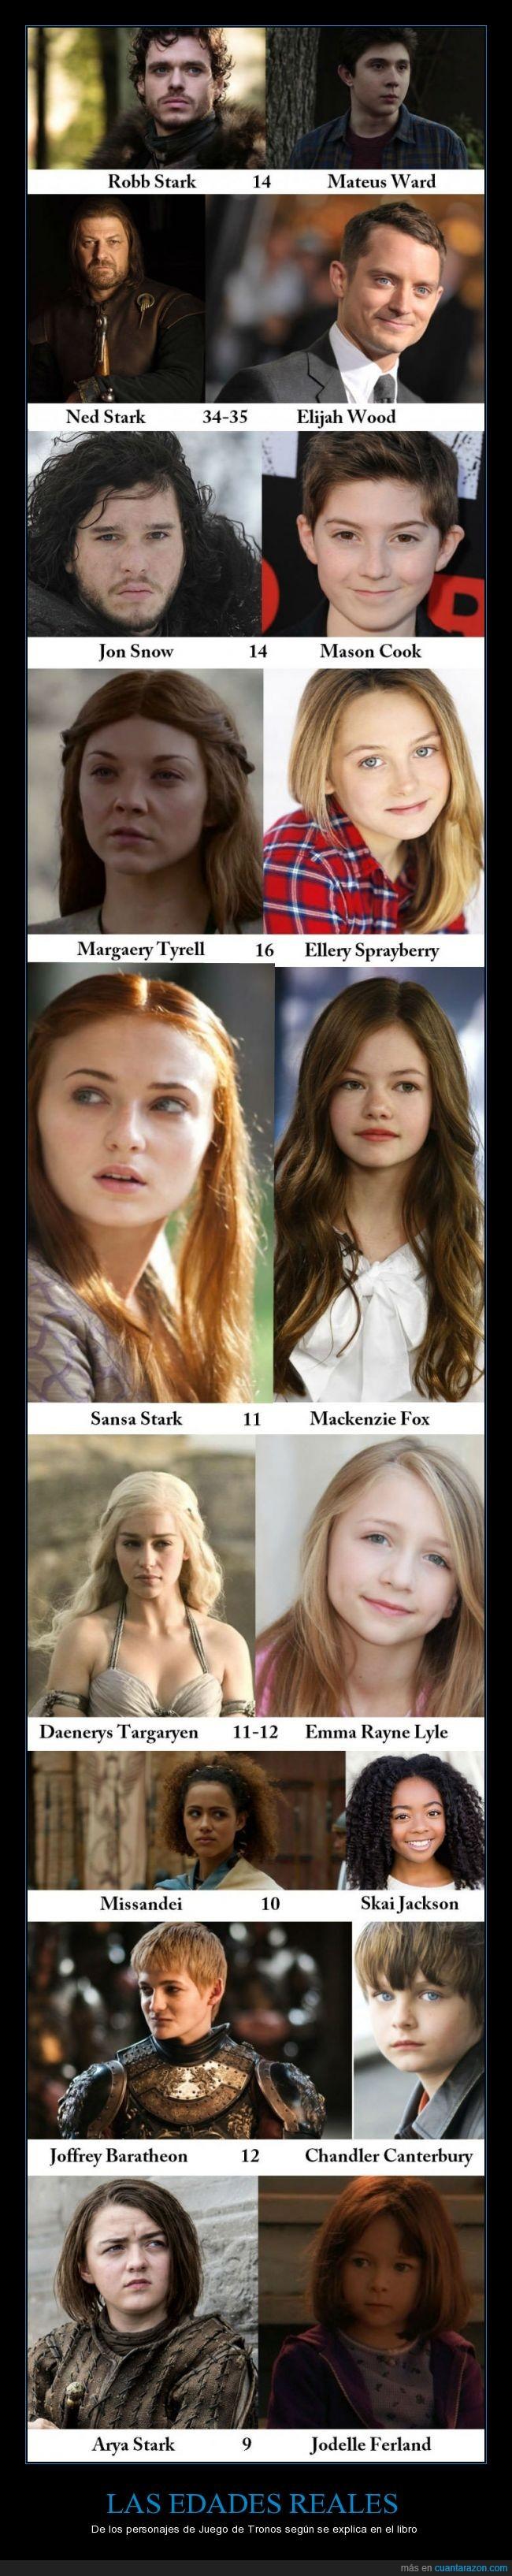 Arya,edad,game of thrones,got,jdt,juego de tronos,real,Robb,Sansa,Stark